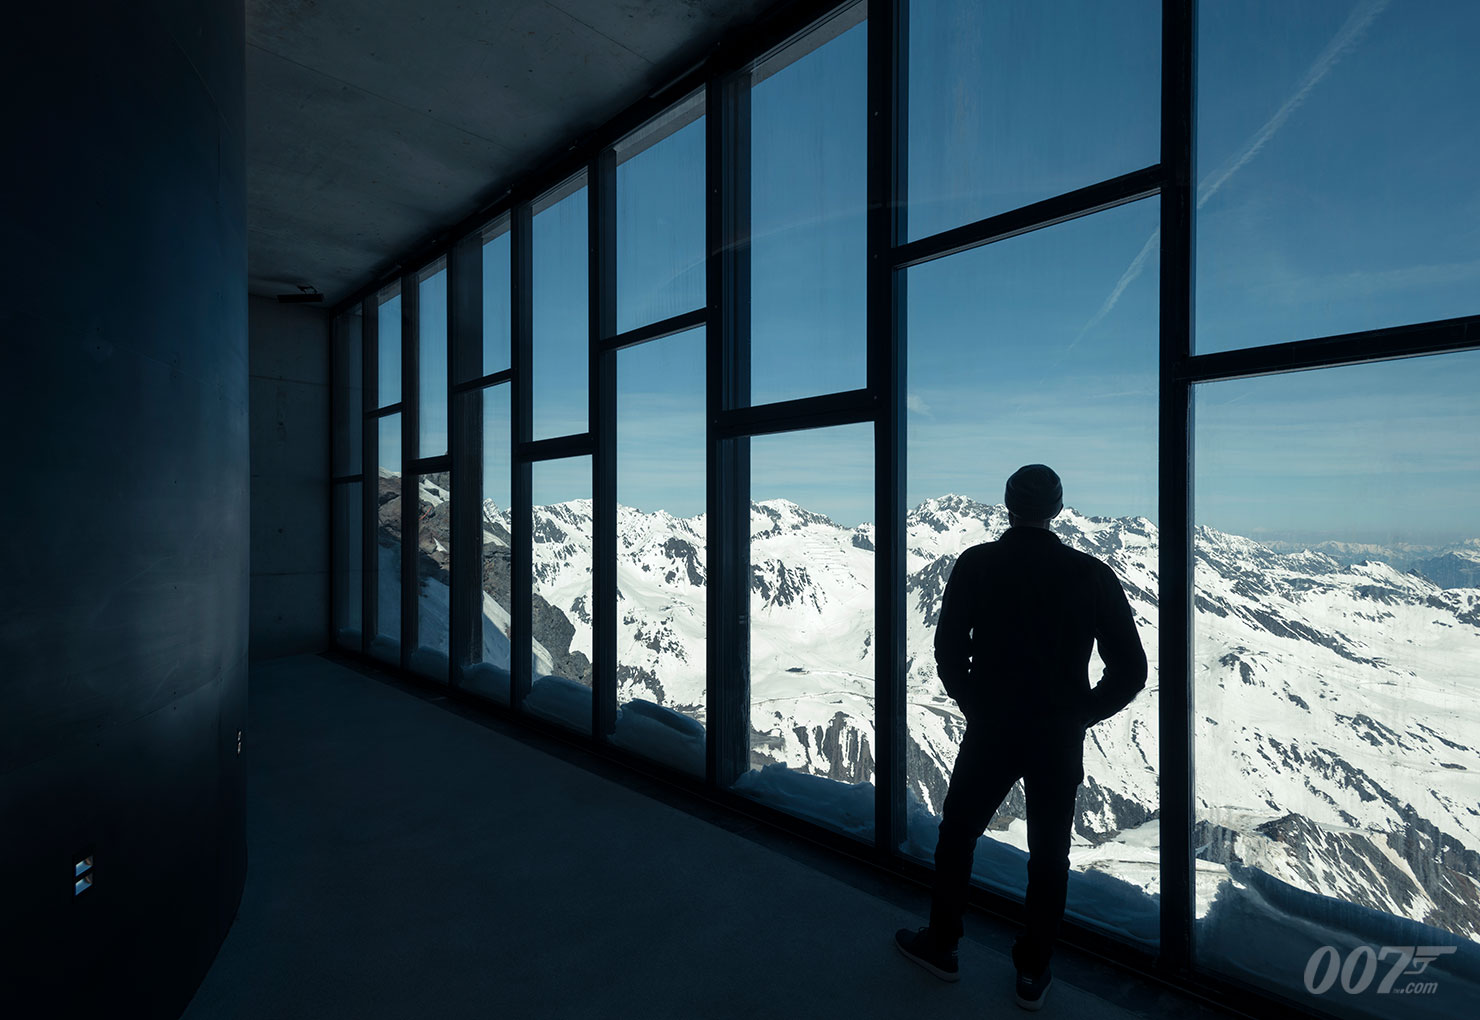 6.-Valley-Passage-007-ELEMENTS-Photo-credit-Kristopher-Grunert_Gallery.jpg